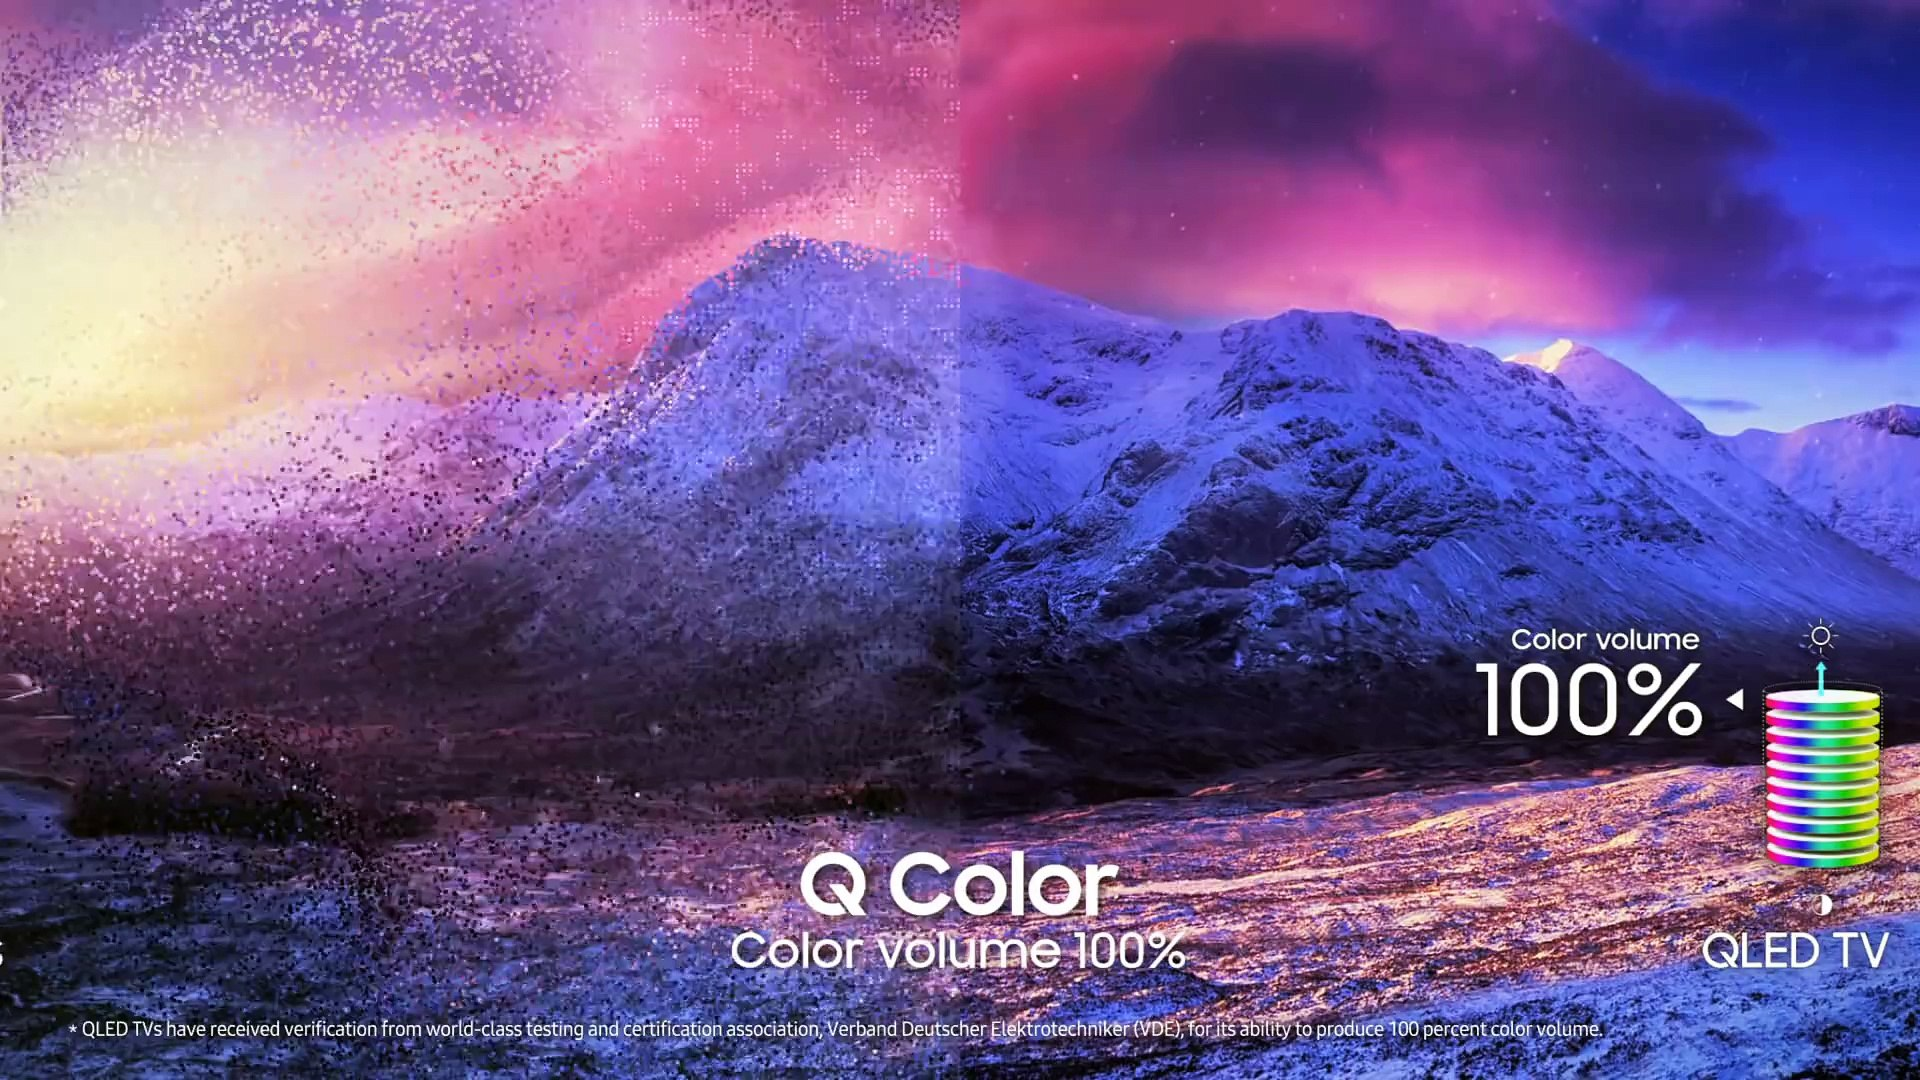 Samsung Qled Tv 2018 Q9f 4k Uhd Hdr Tv Video Dailymotion